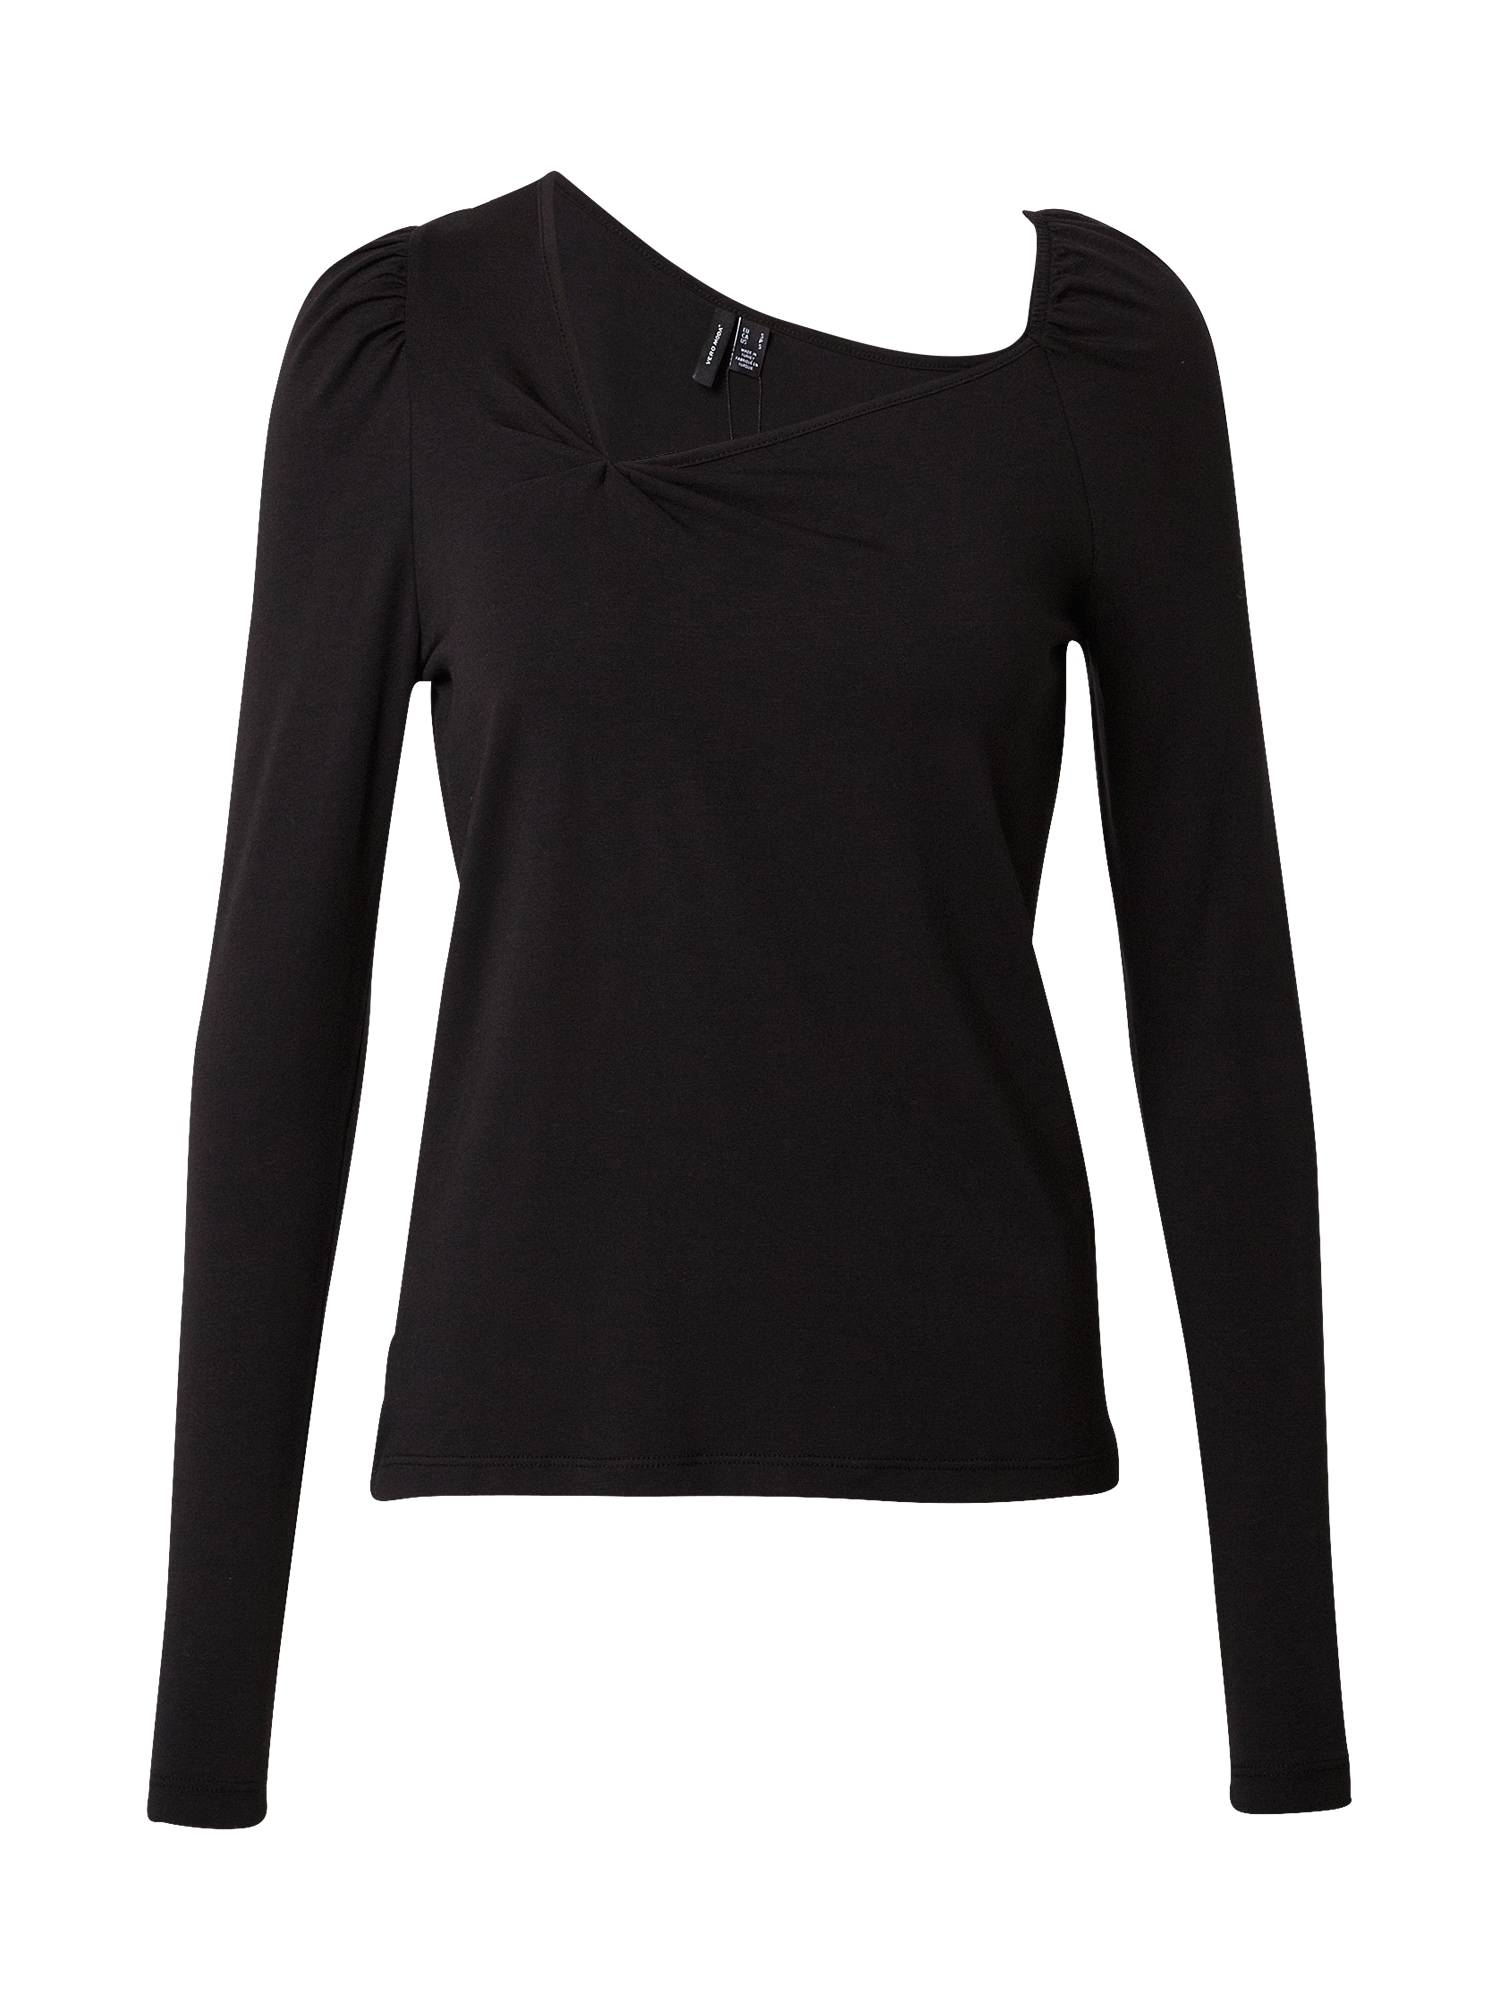 VERO MODA T-shirt 'Panda'  - Noir - Taille: XS - female